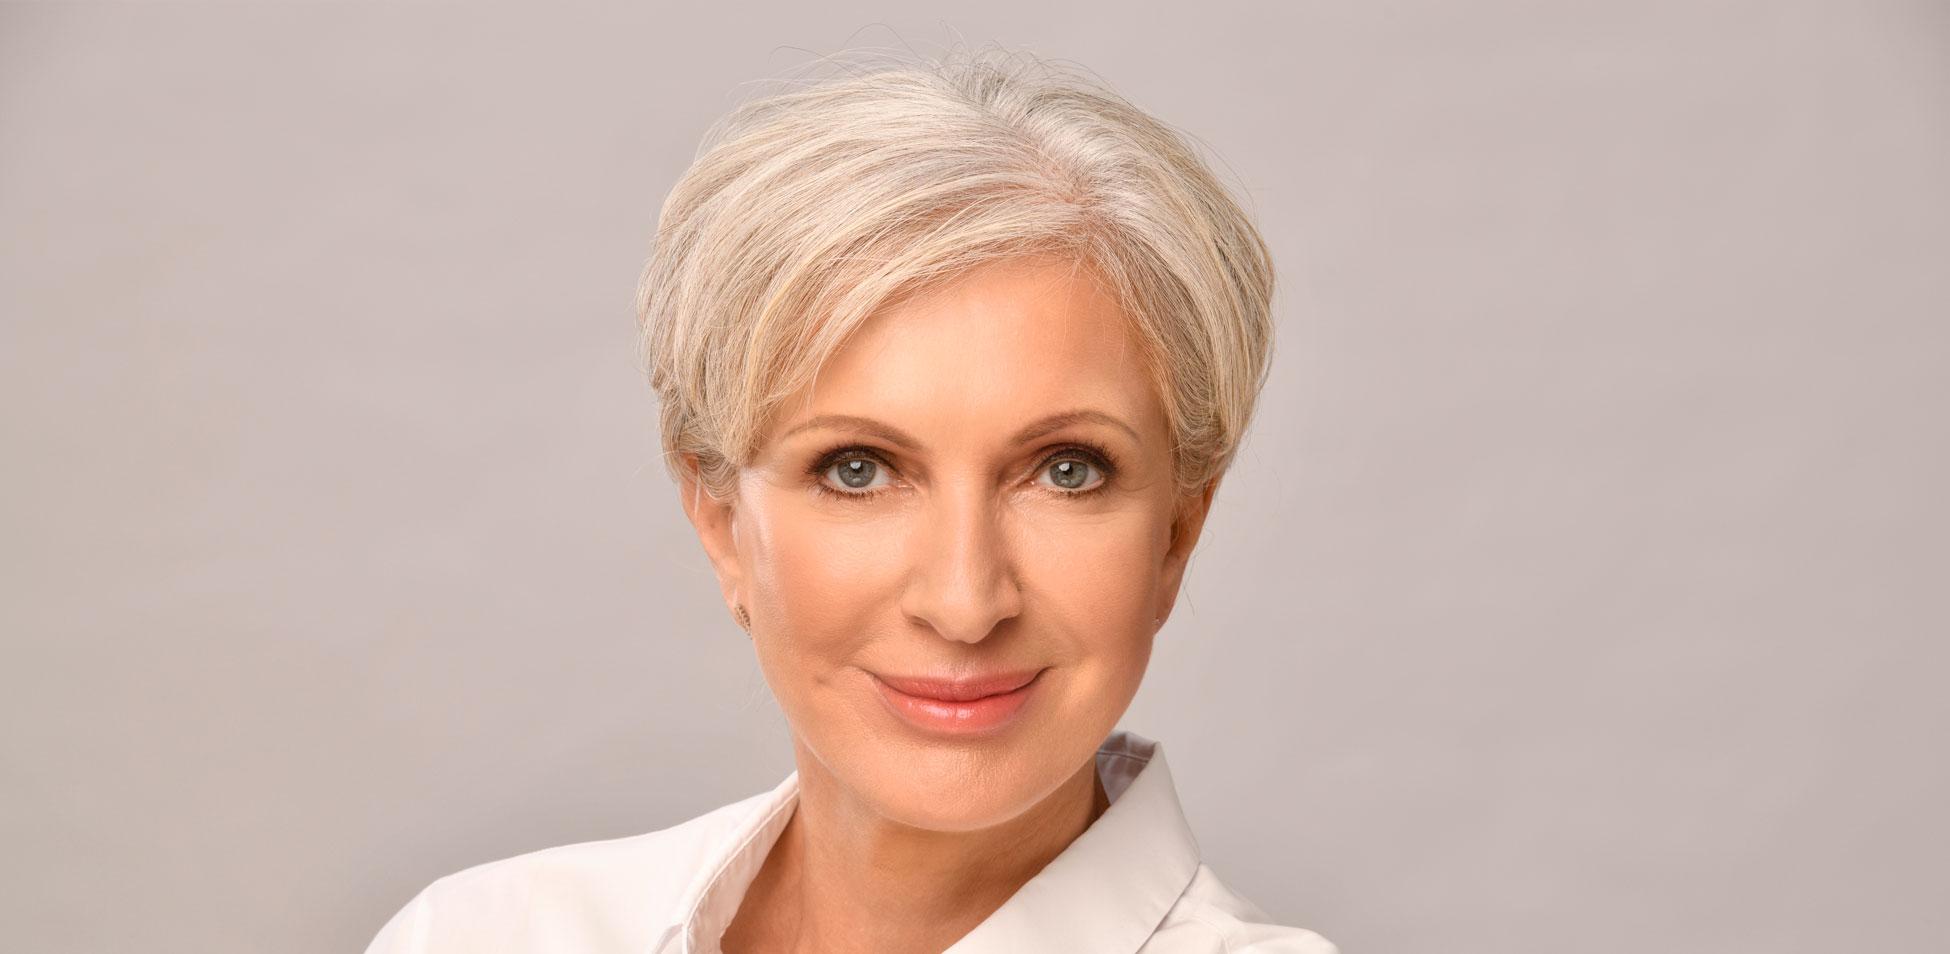 Petra Michels Das Gesicht